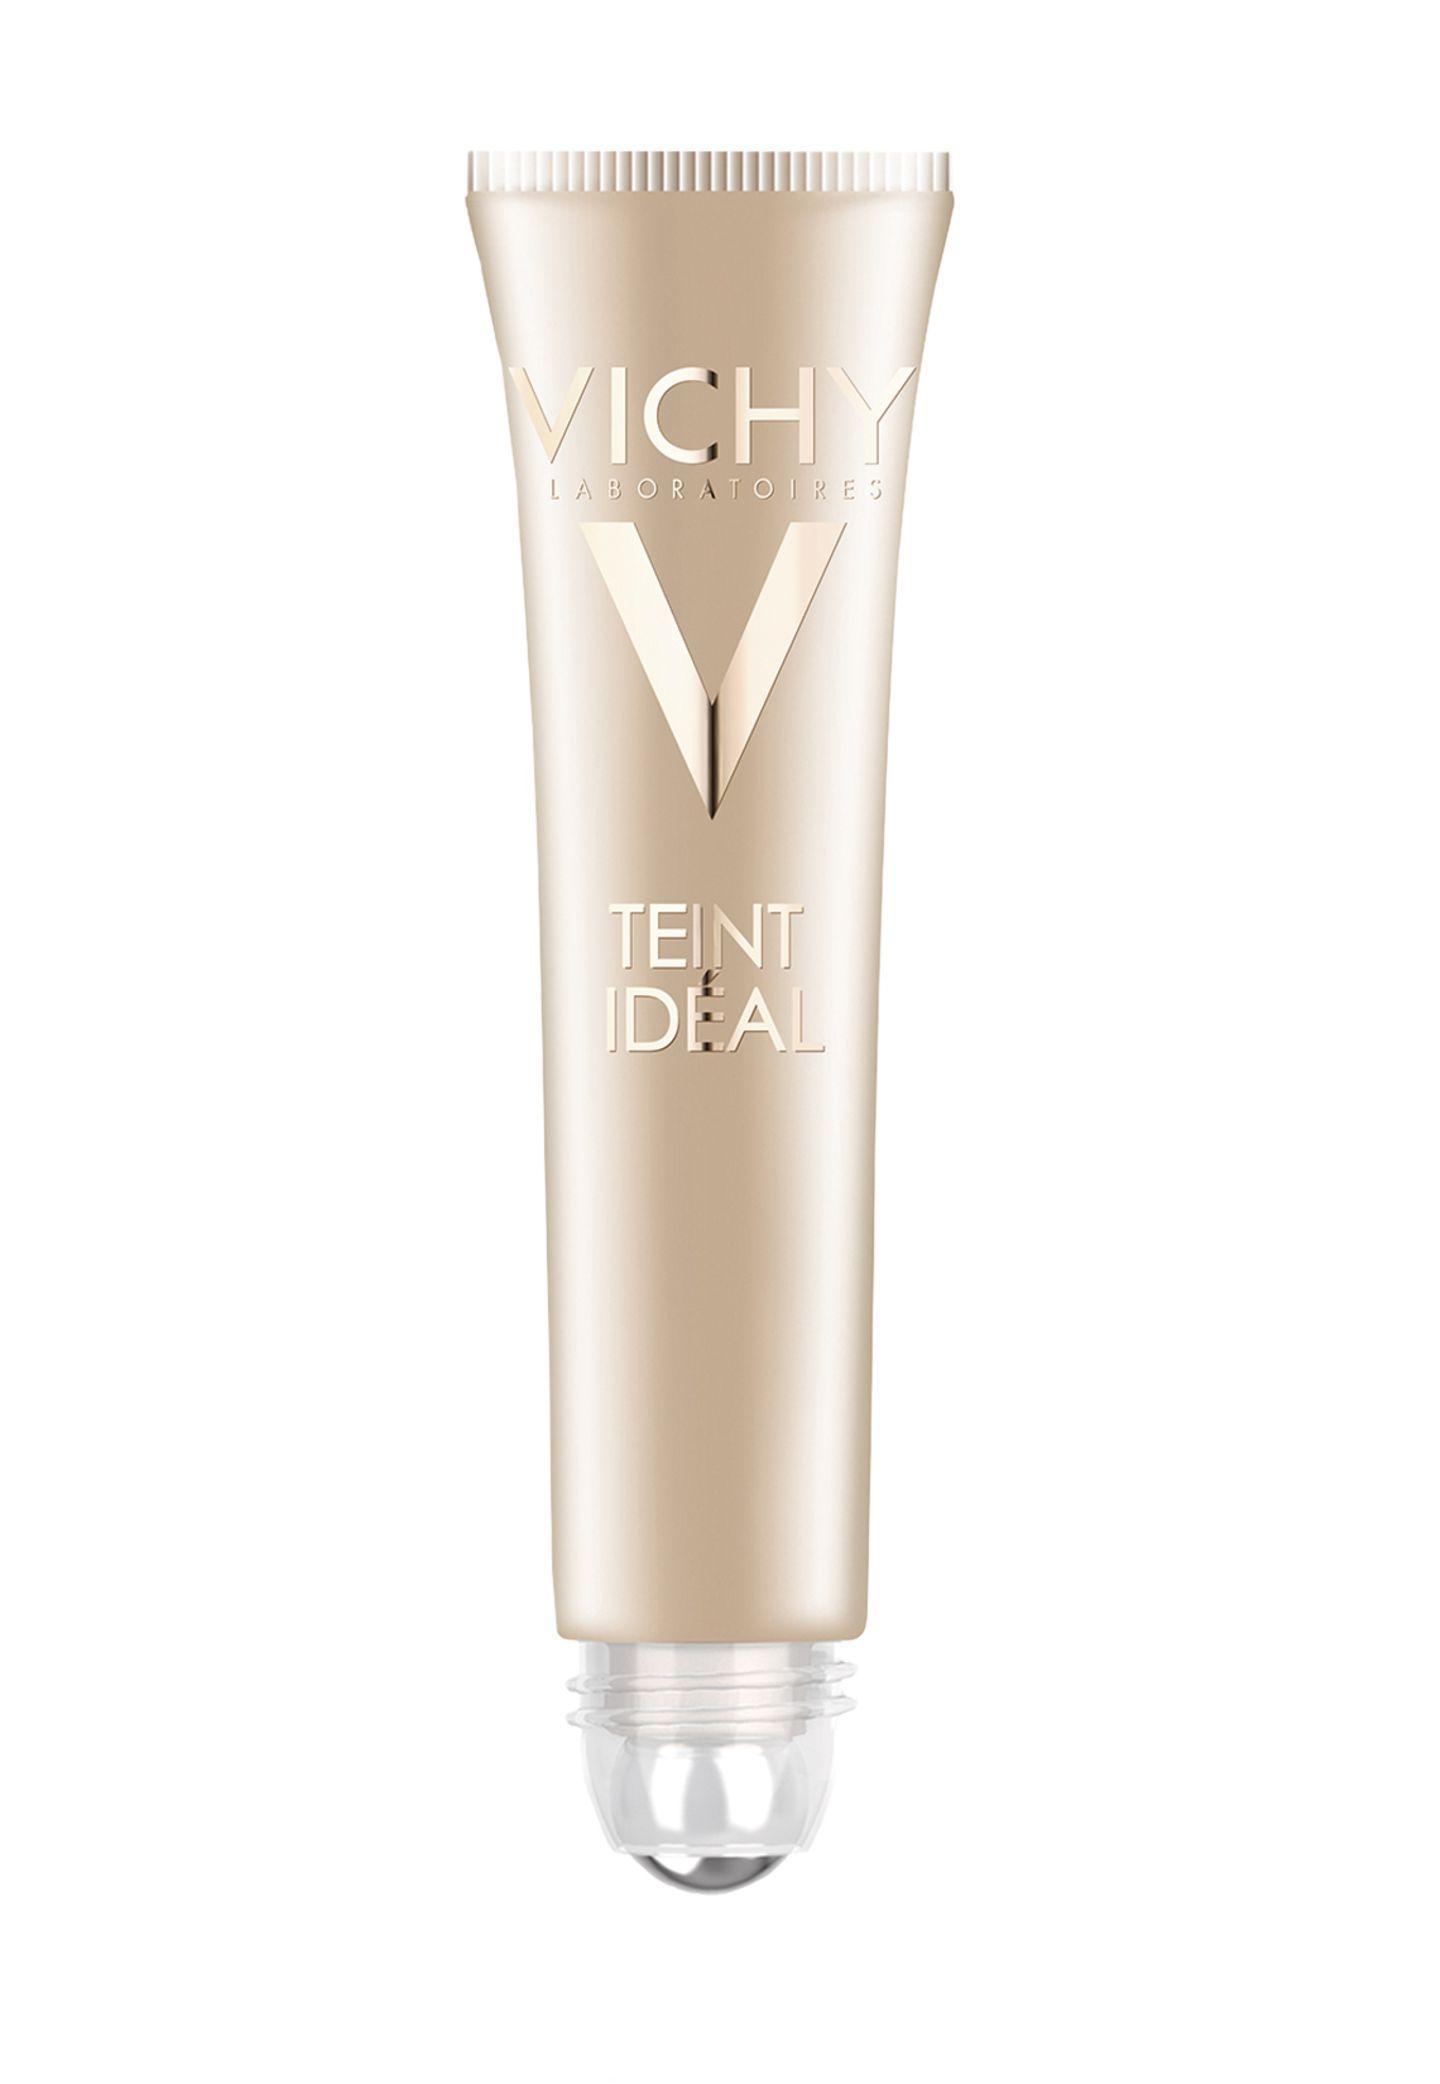 """Teint Ideal Roll-on Highlighter"" von Vichy, 7 ml, ca. 16 Euro"